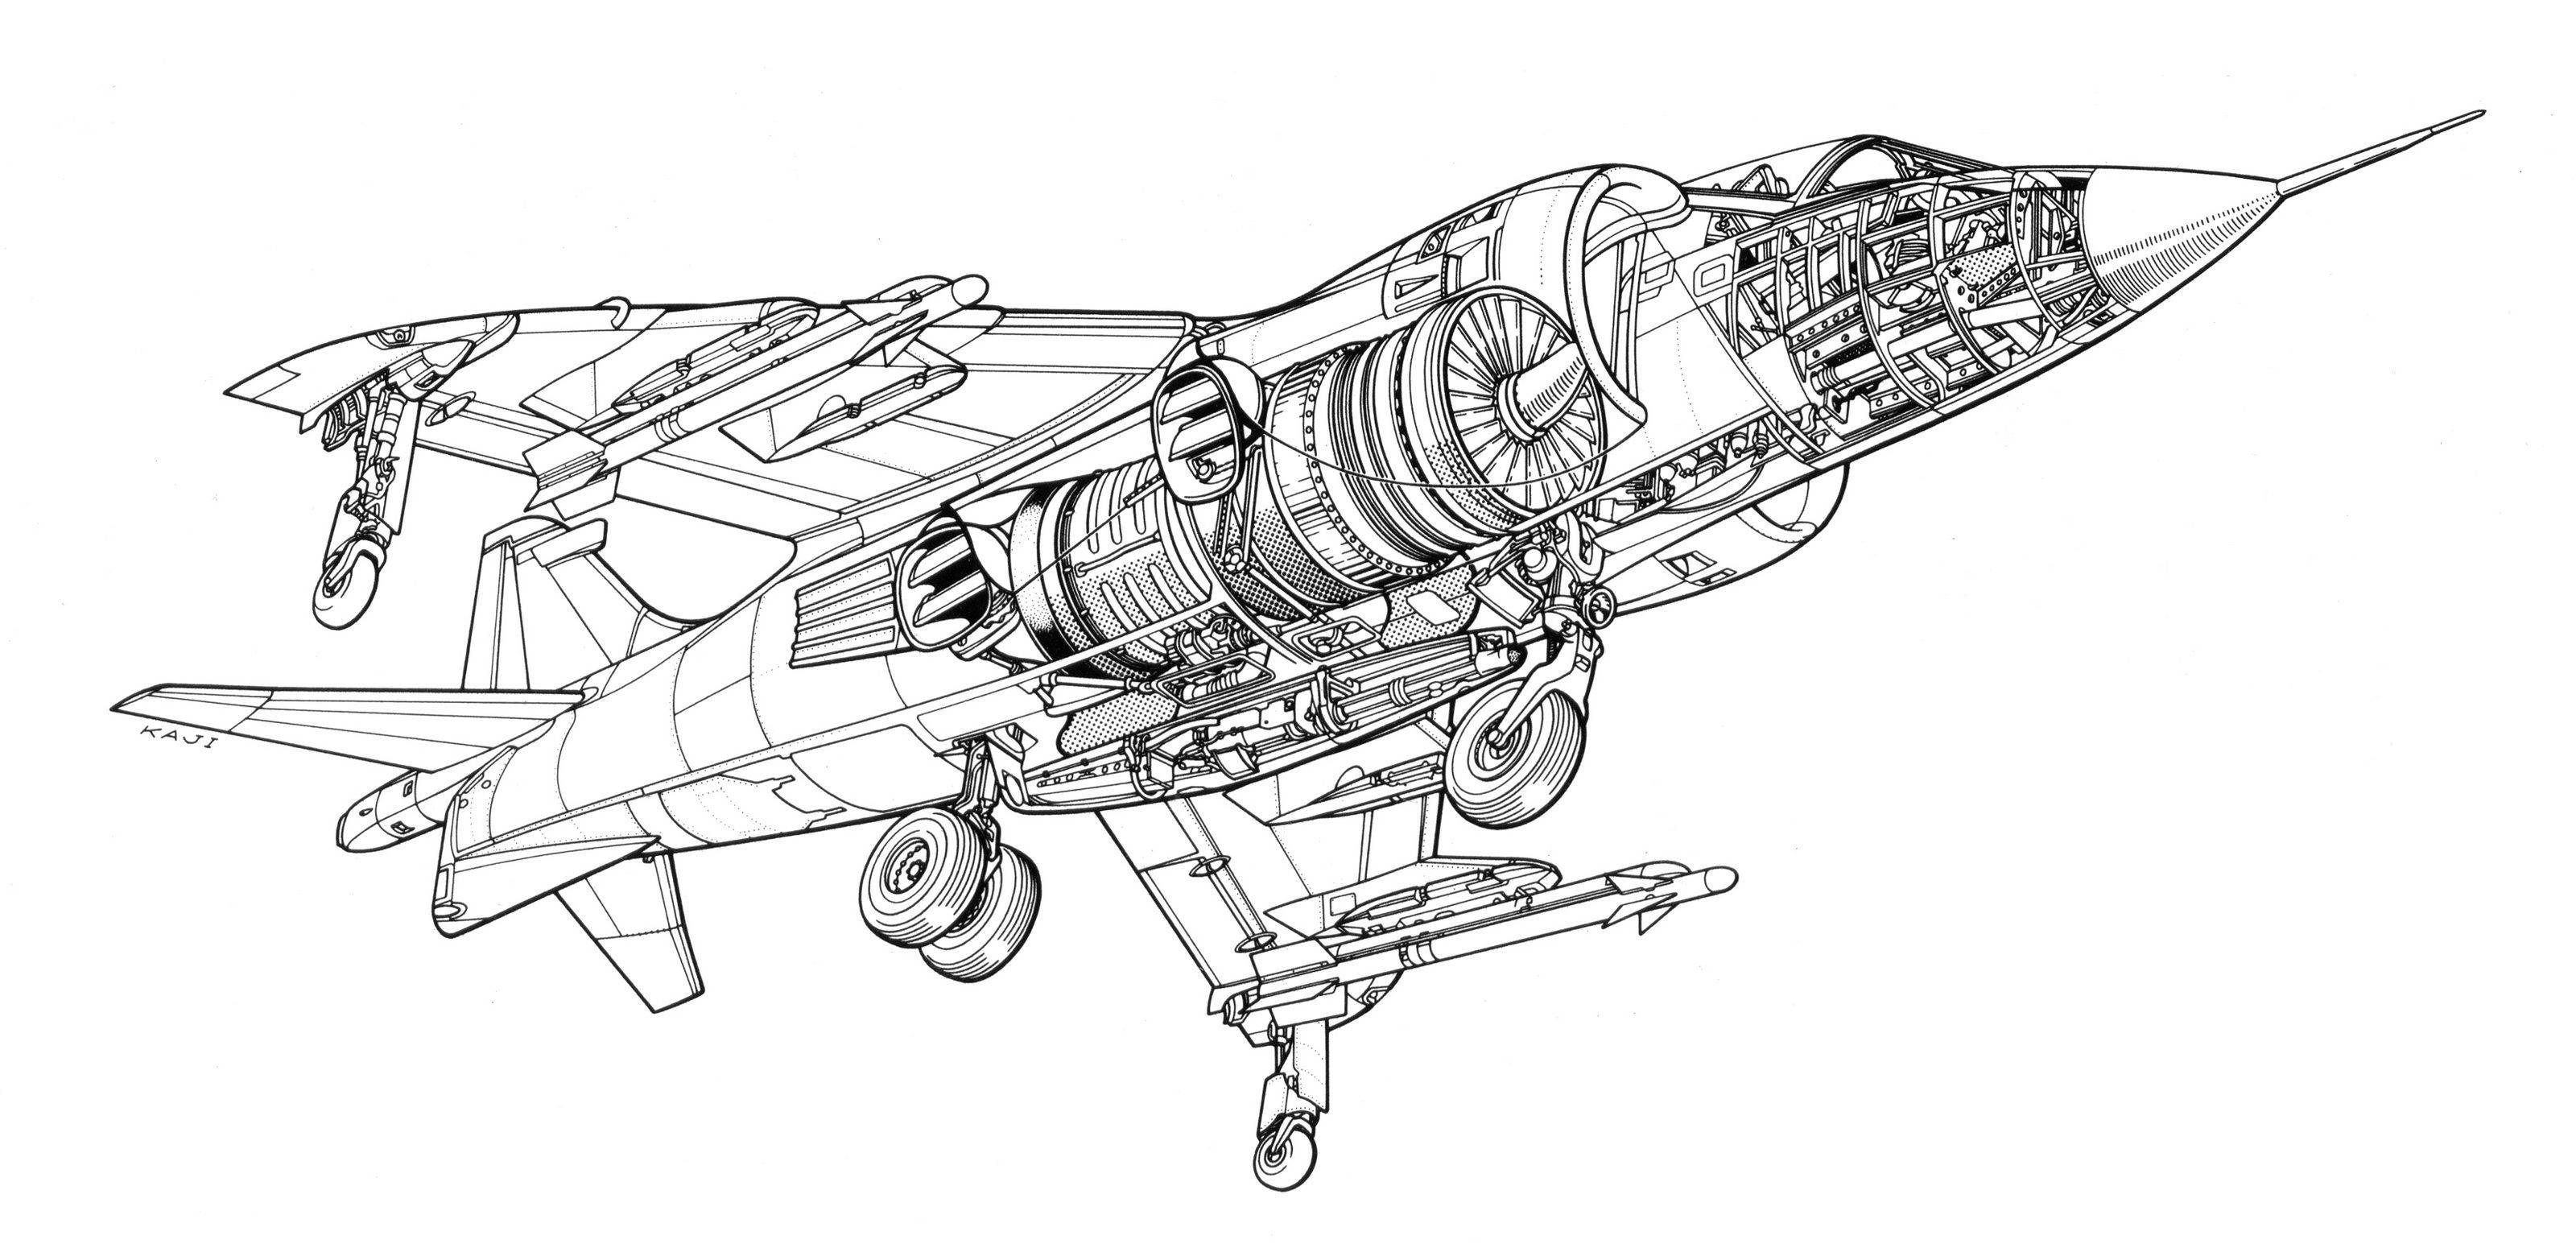 Pin By Graham Hand On Aircraft Cutaways